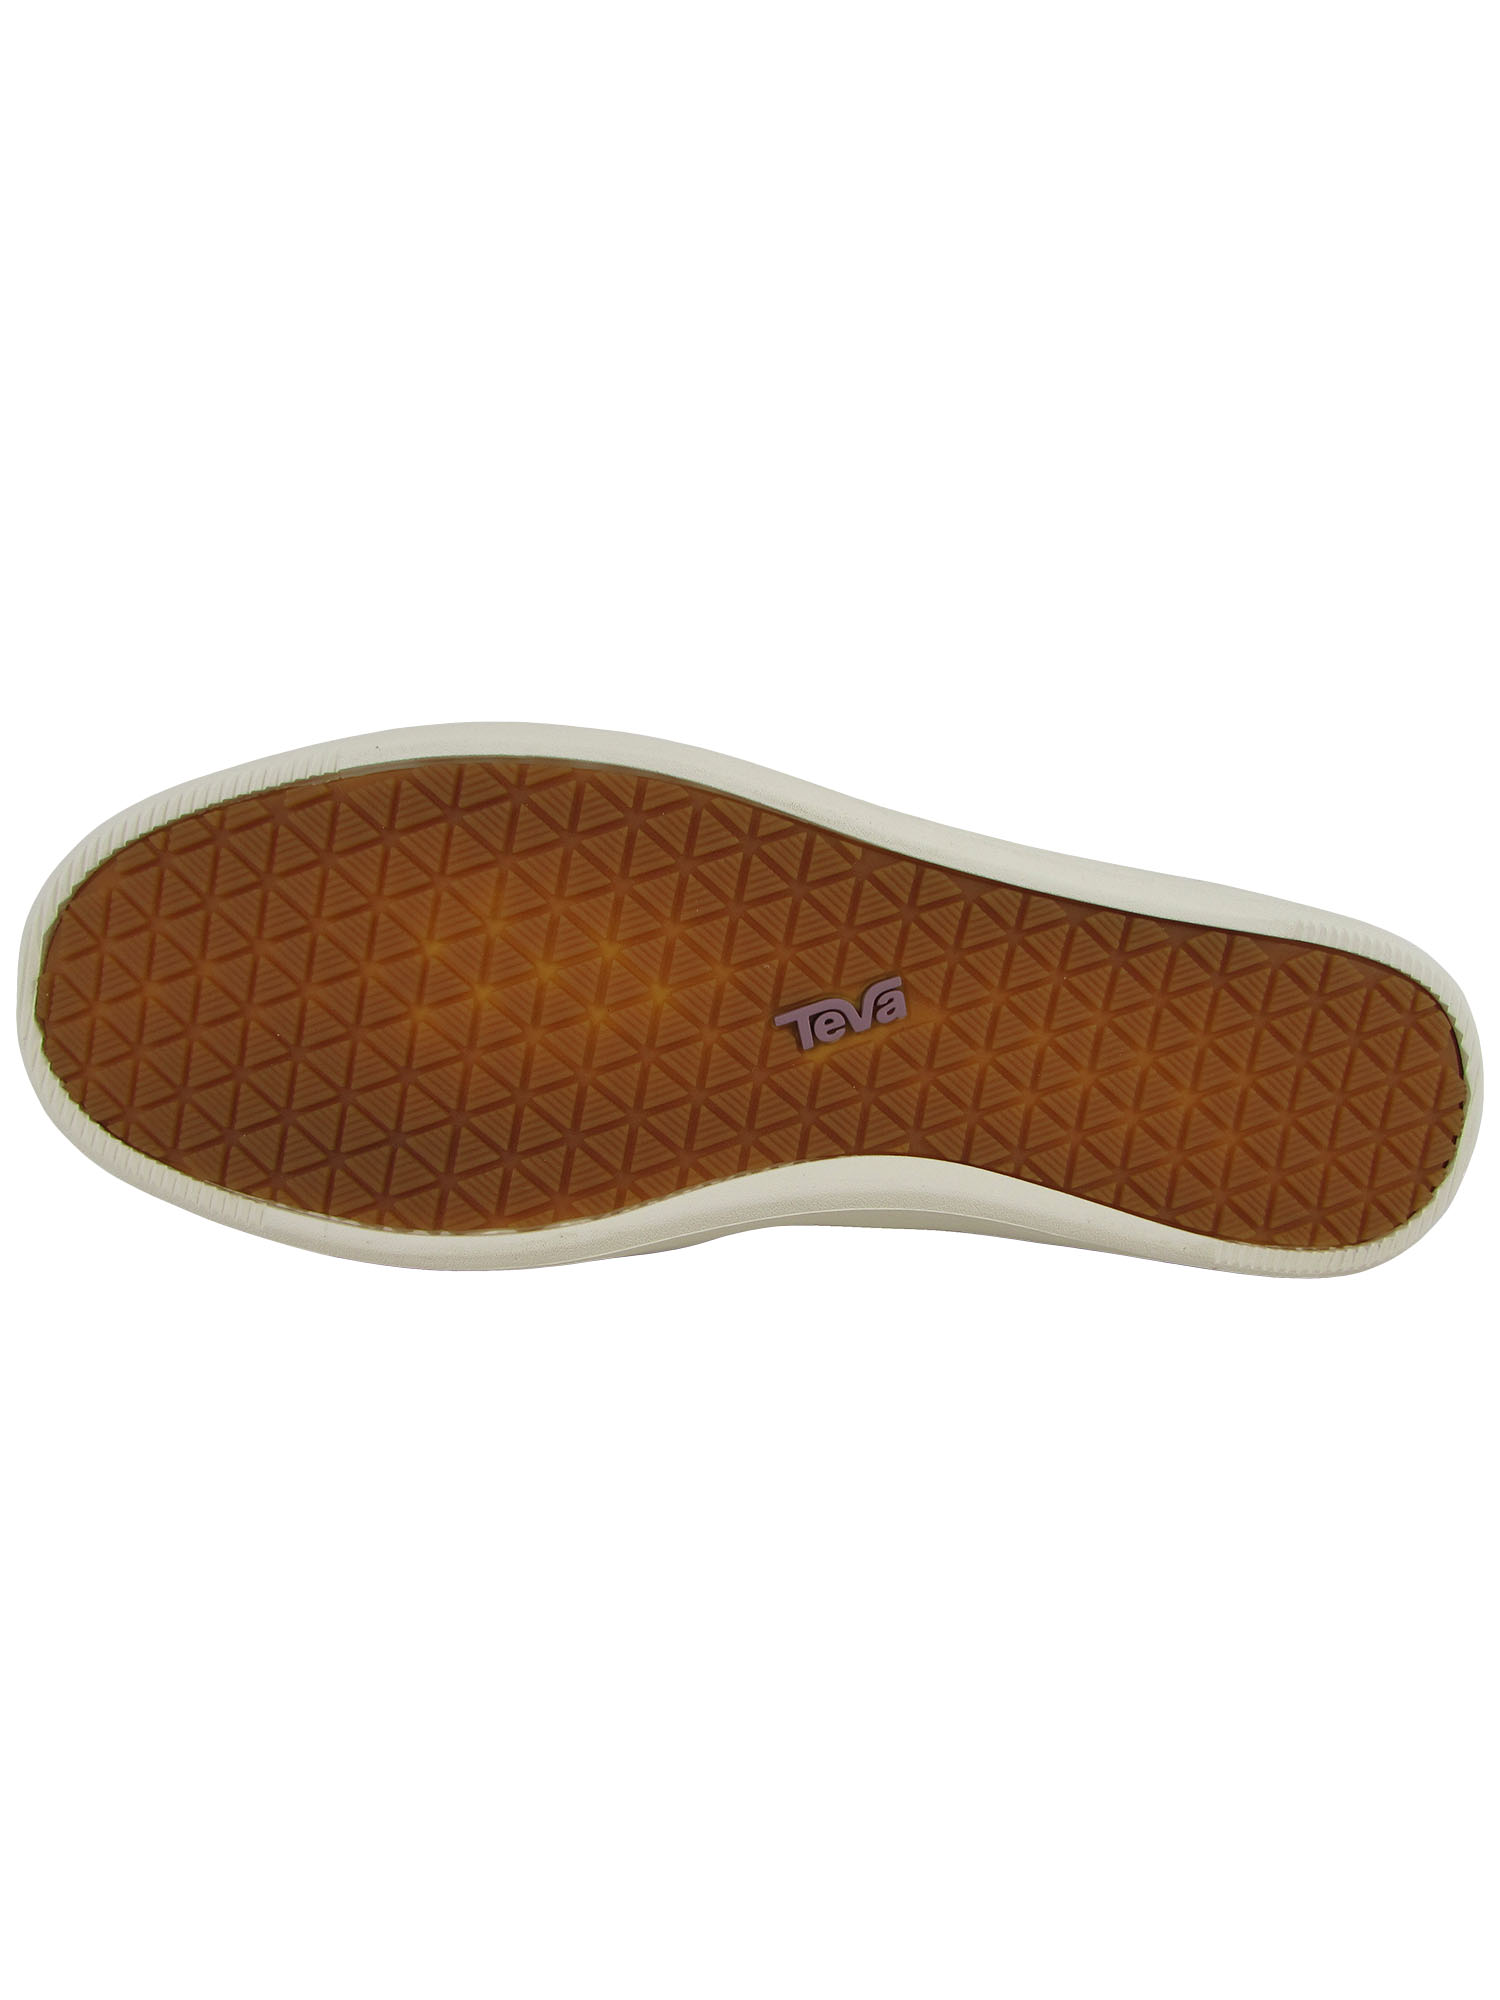 Teva-Womens-Willow-Slip-On-Sneaker-Shoes thumbnail 6